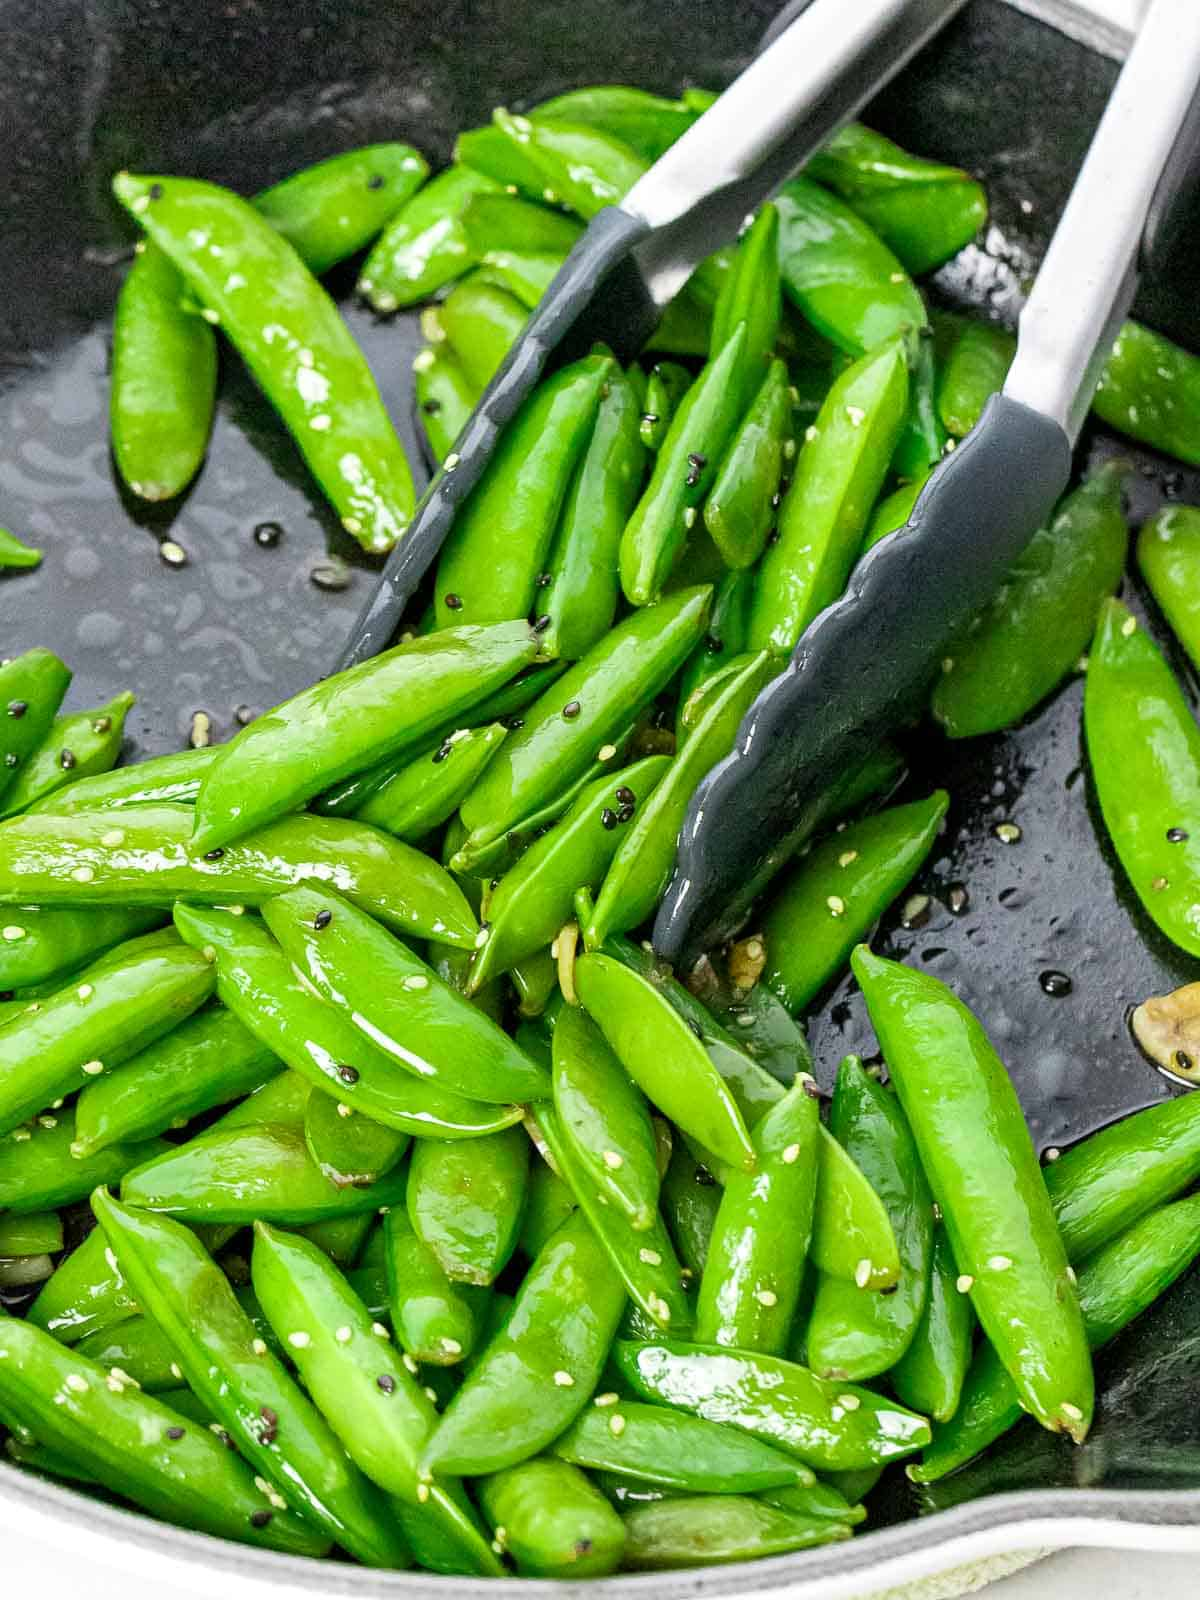 Garlic sesame sugar snap peas stir fried in a dark pan with a pair of tongs.